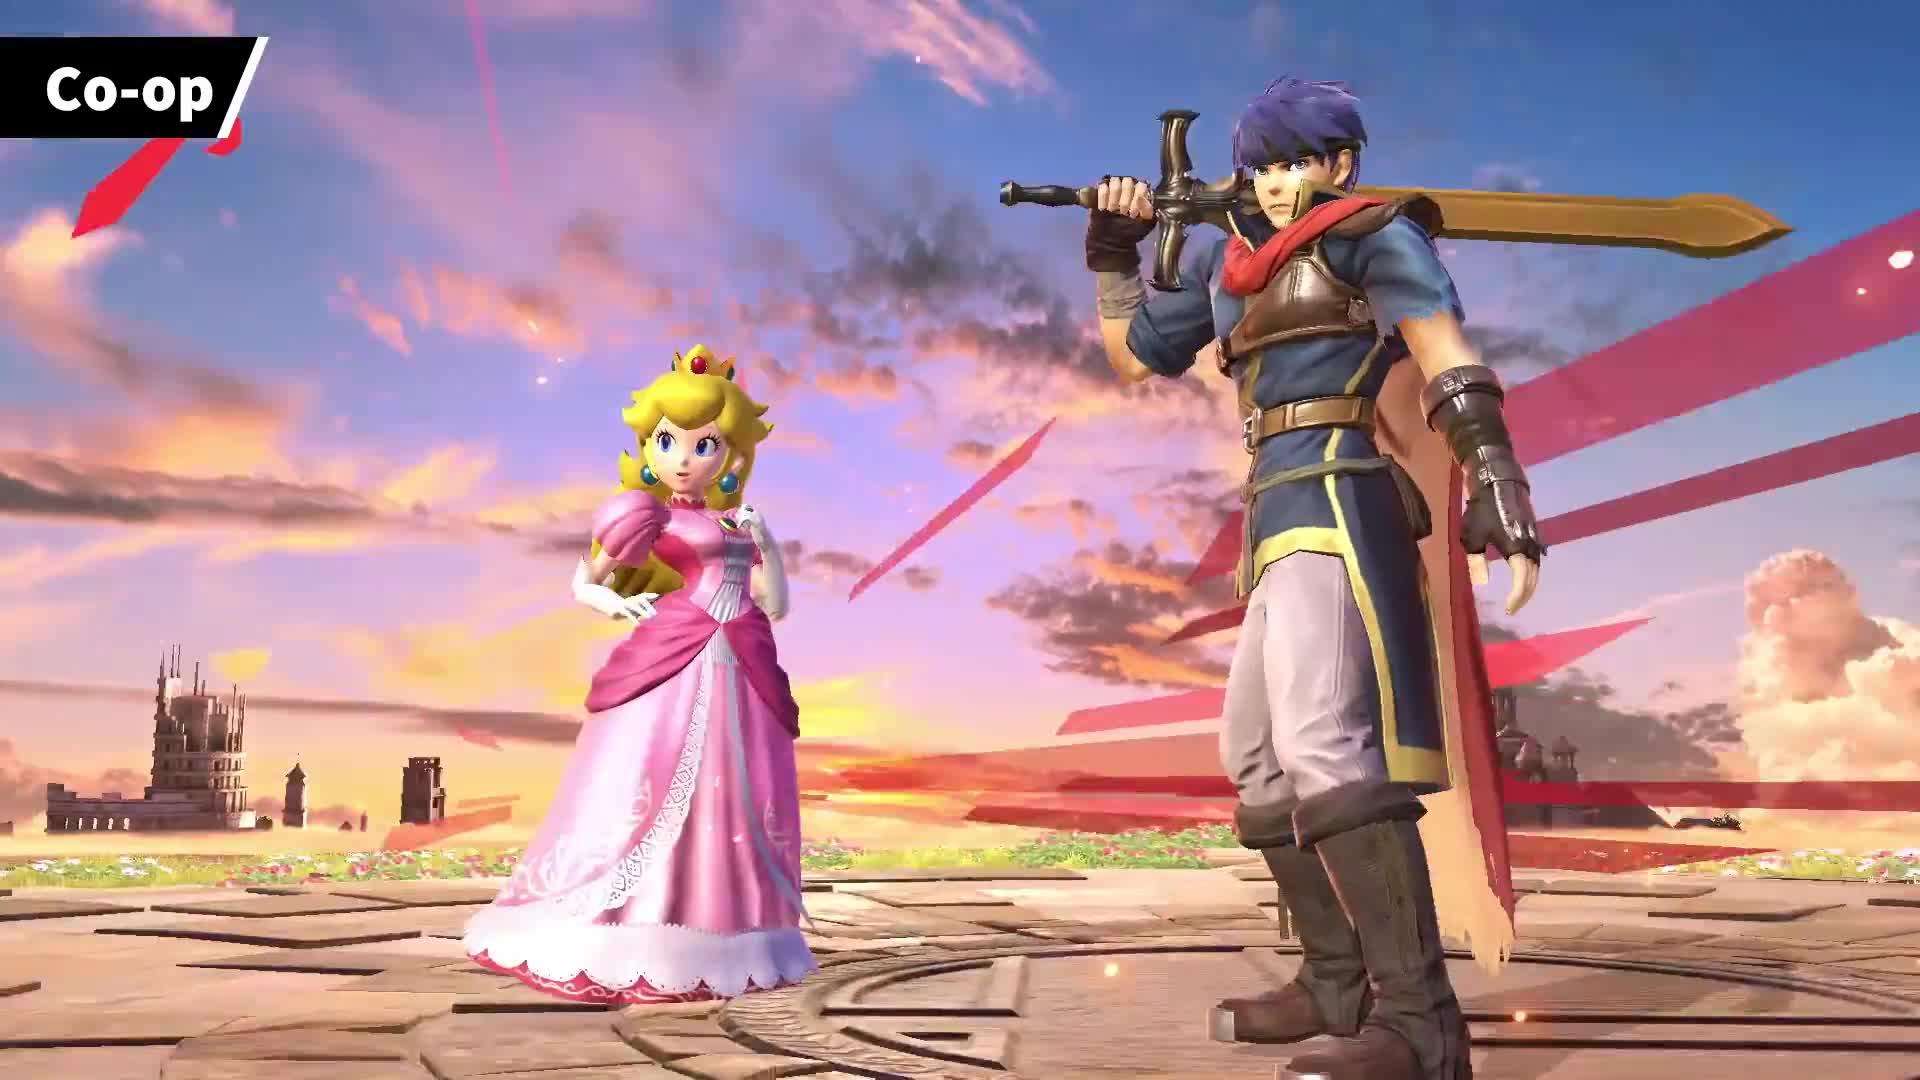 Trailer, Nintendo, Nintendo Switch, Switch, Prügelspiel, Super Smash Bros. Ultimate, Super Smash Bros., Smash Bros.